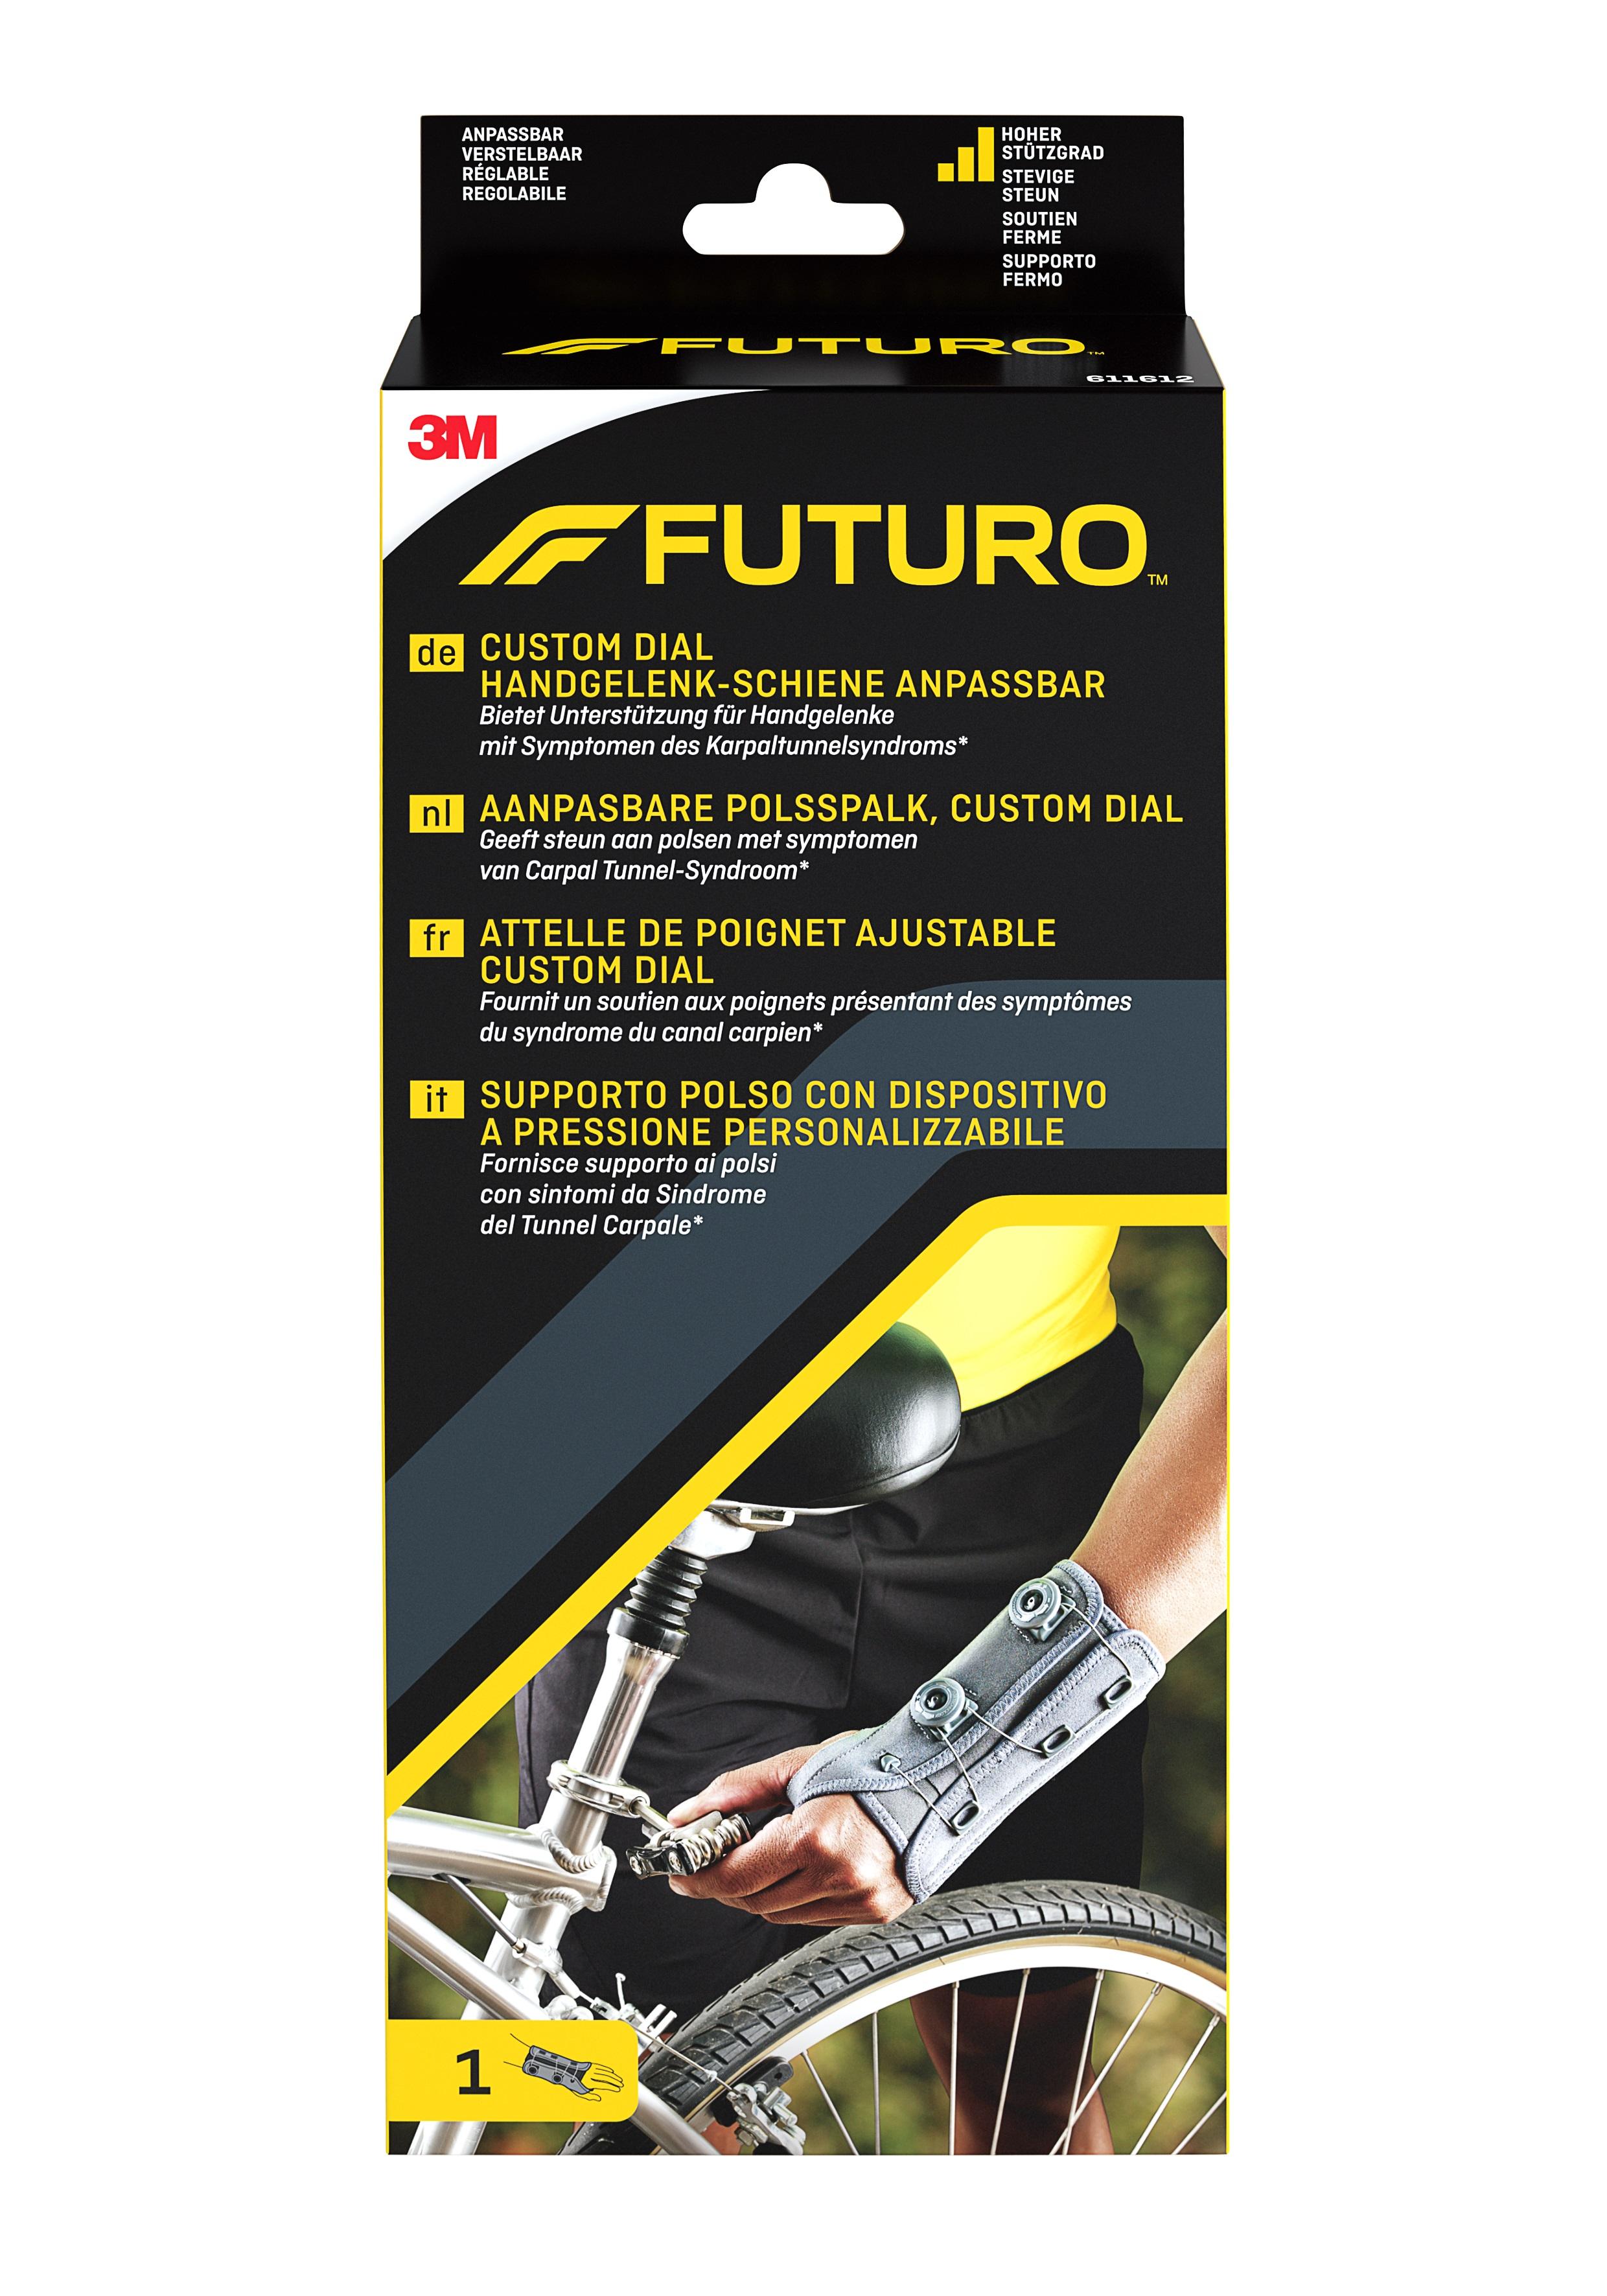 FUTURO™ Custom Dial Handgelenkschiene anpassbar